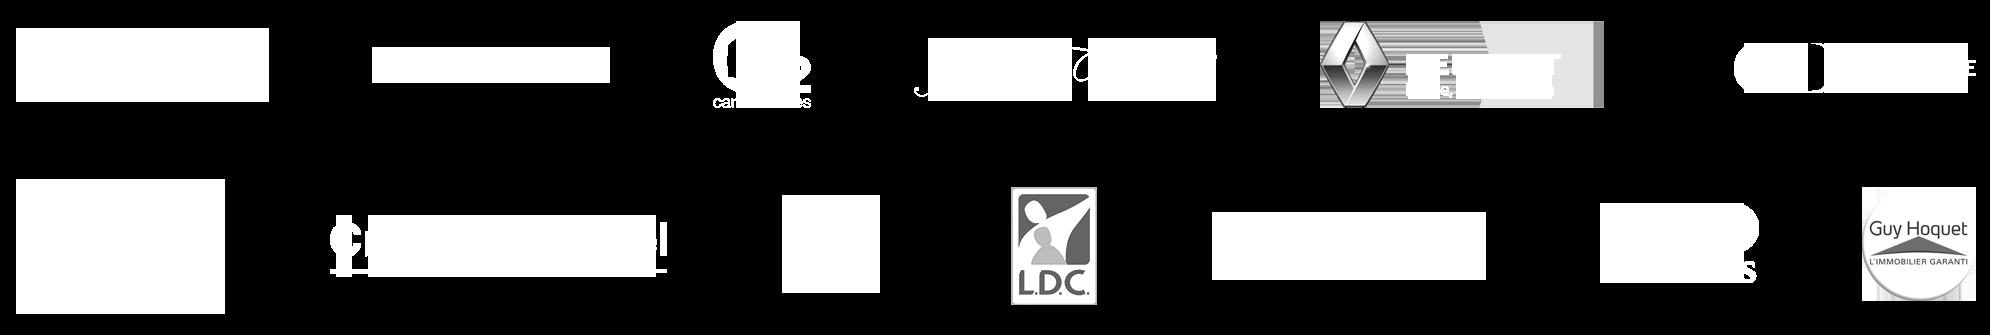 logos-clients-hd-v3.png